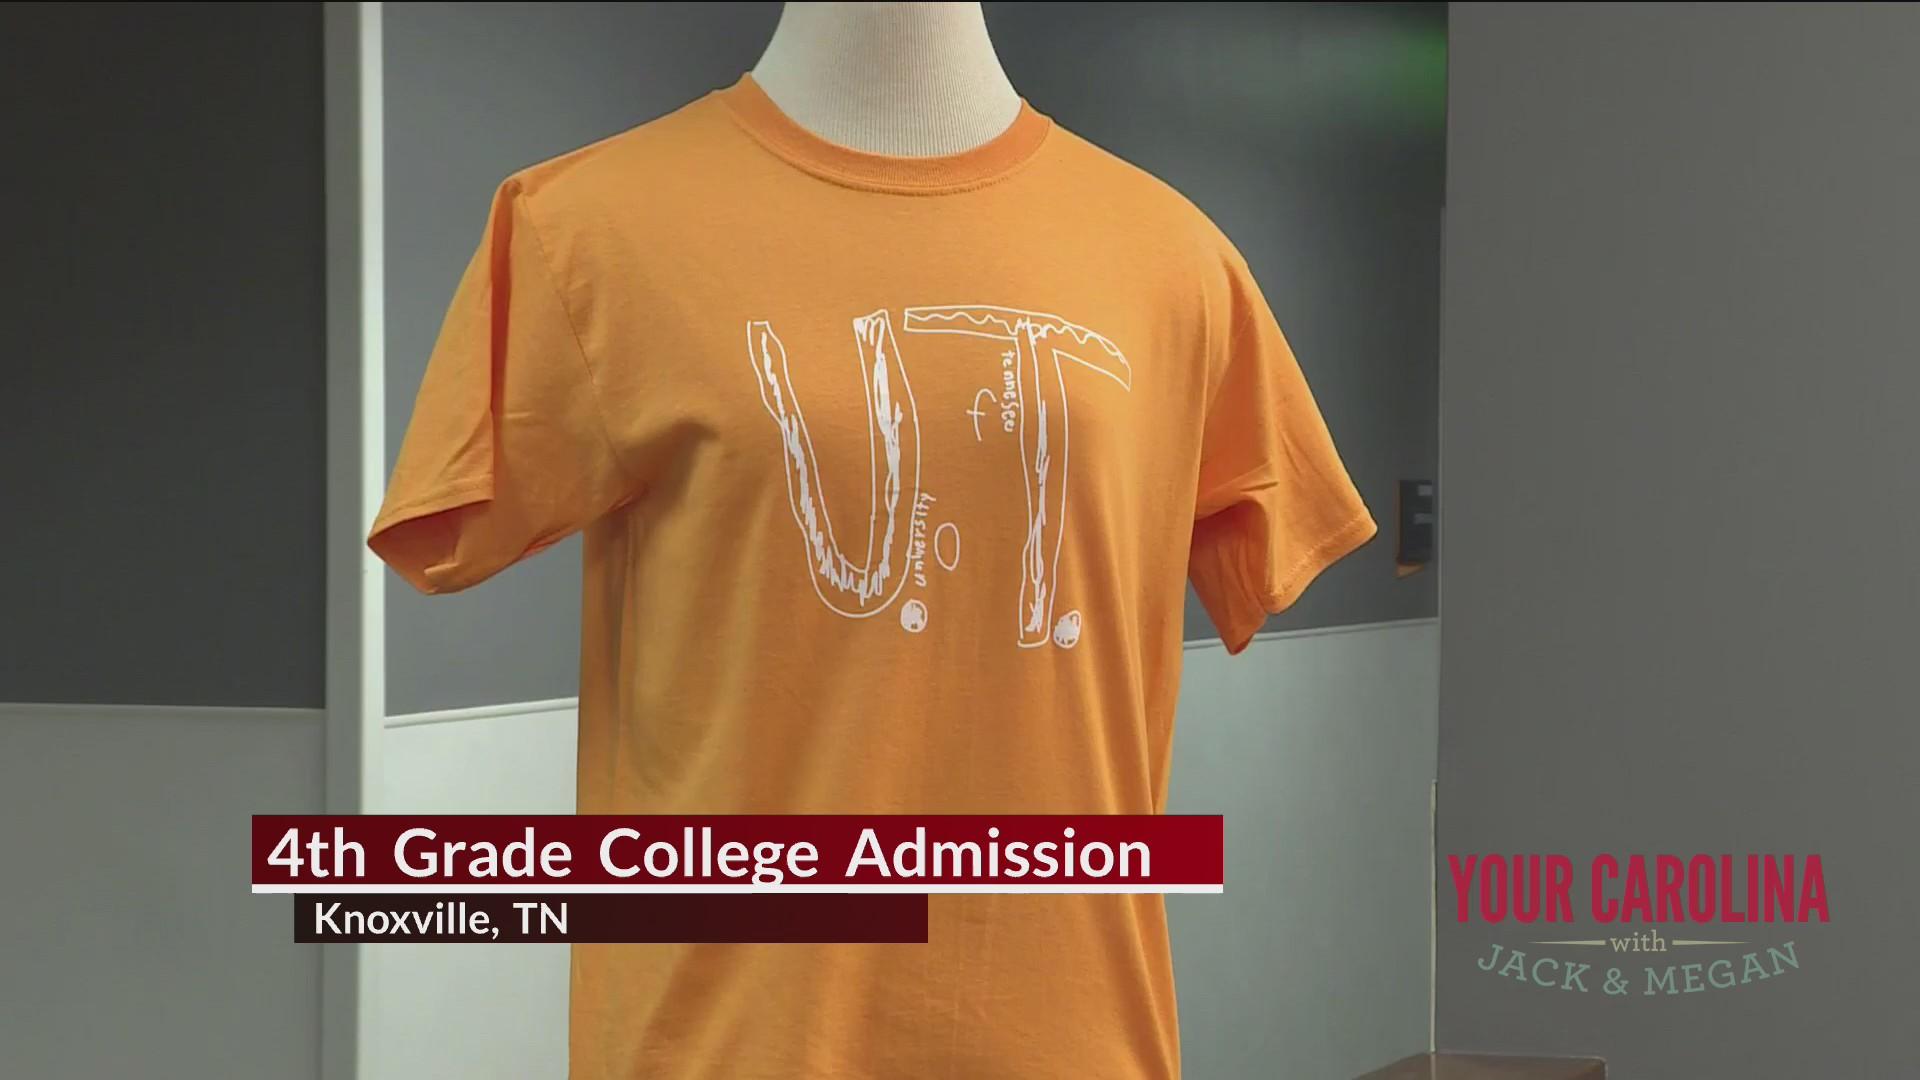 Good News - 4th Grade College Admission